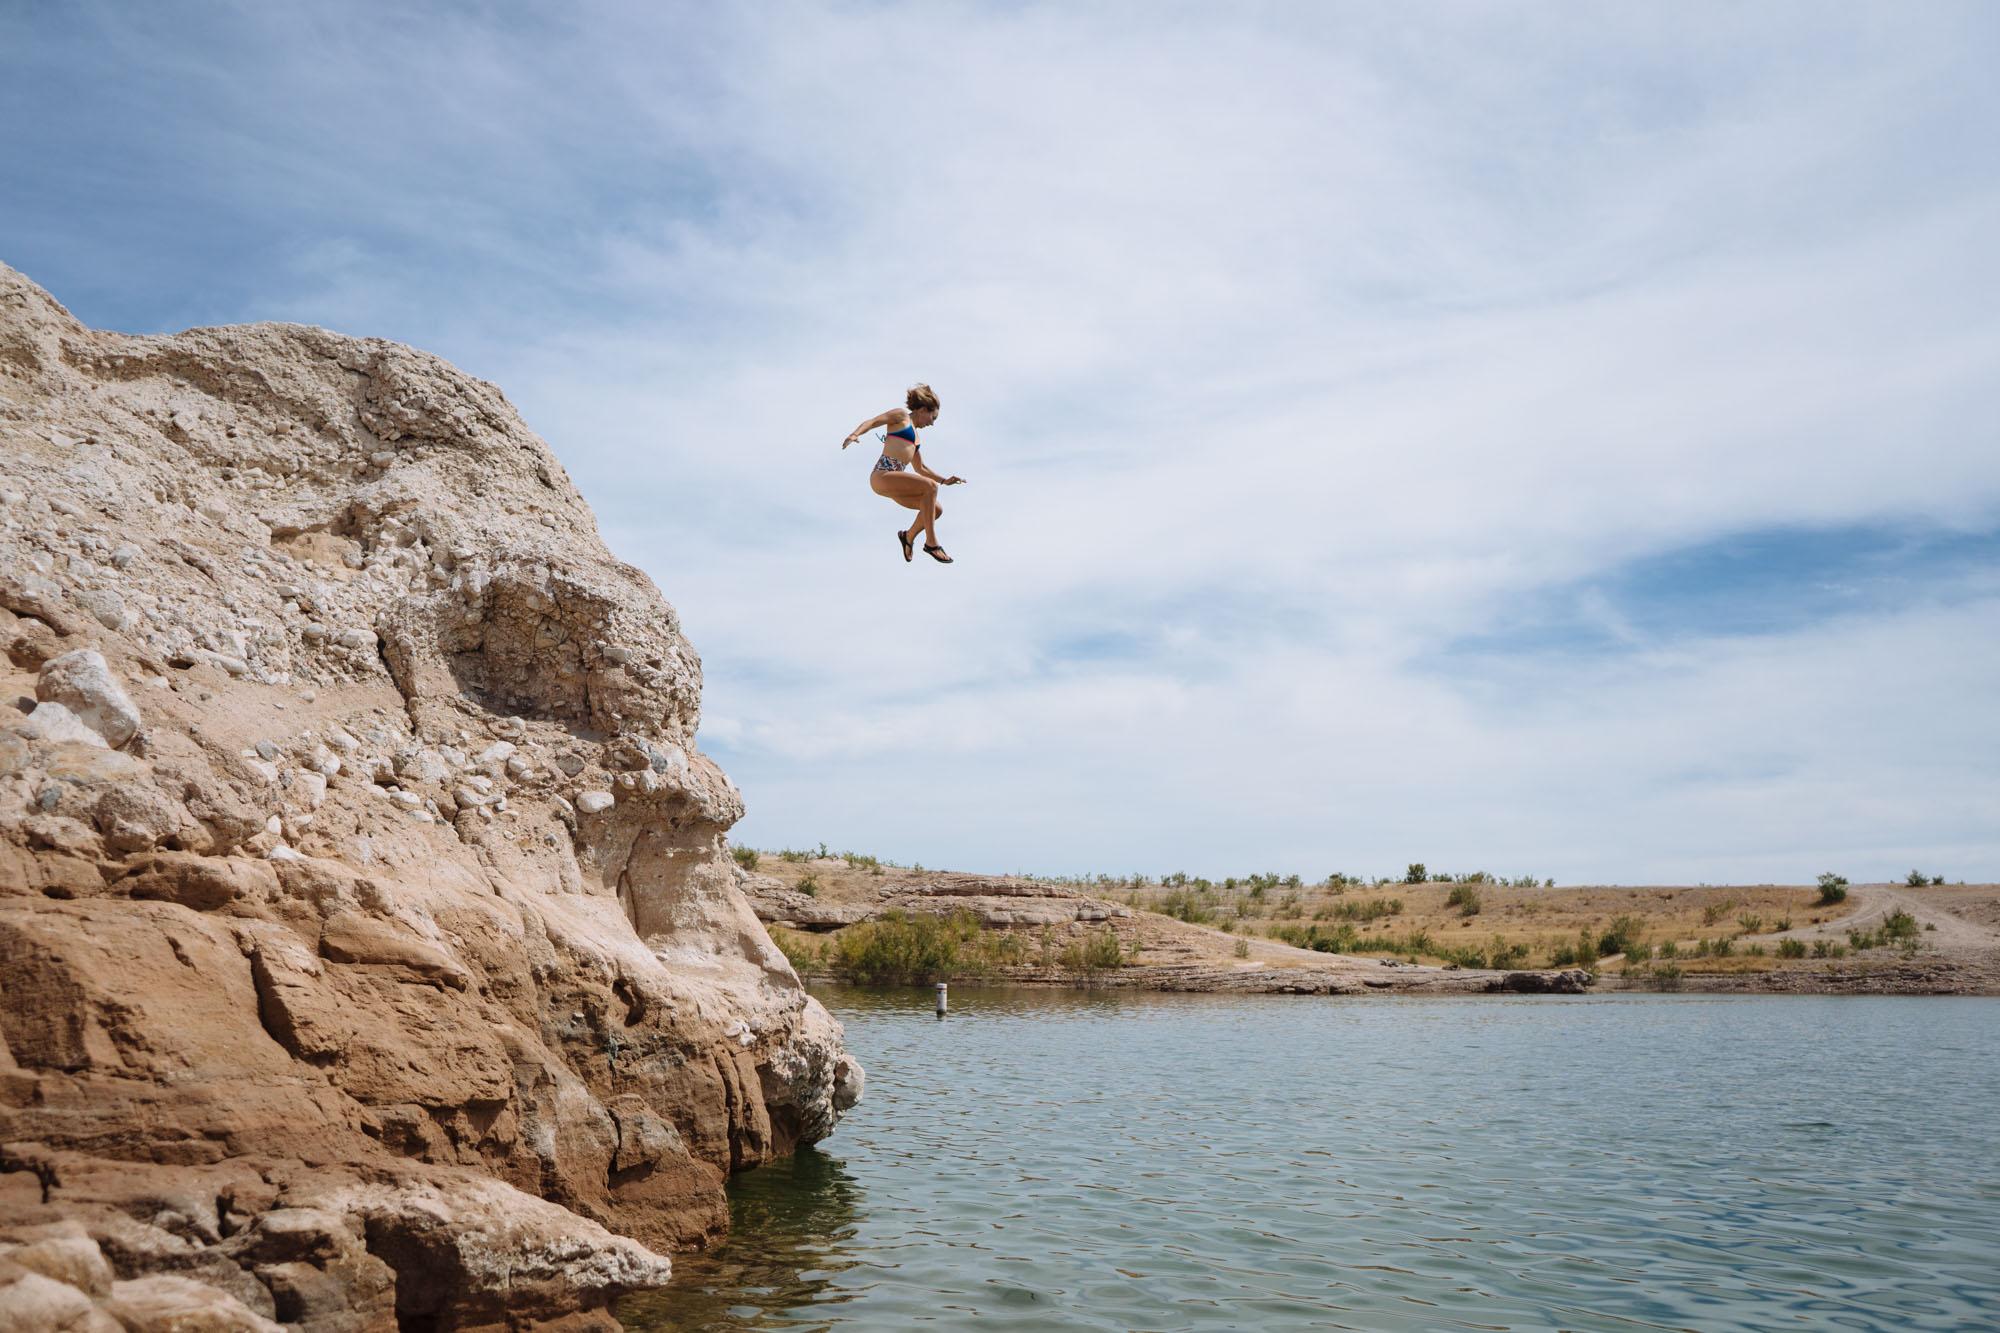 MAK's jump